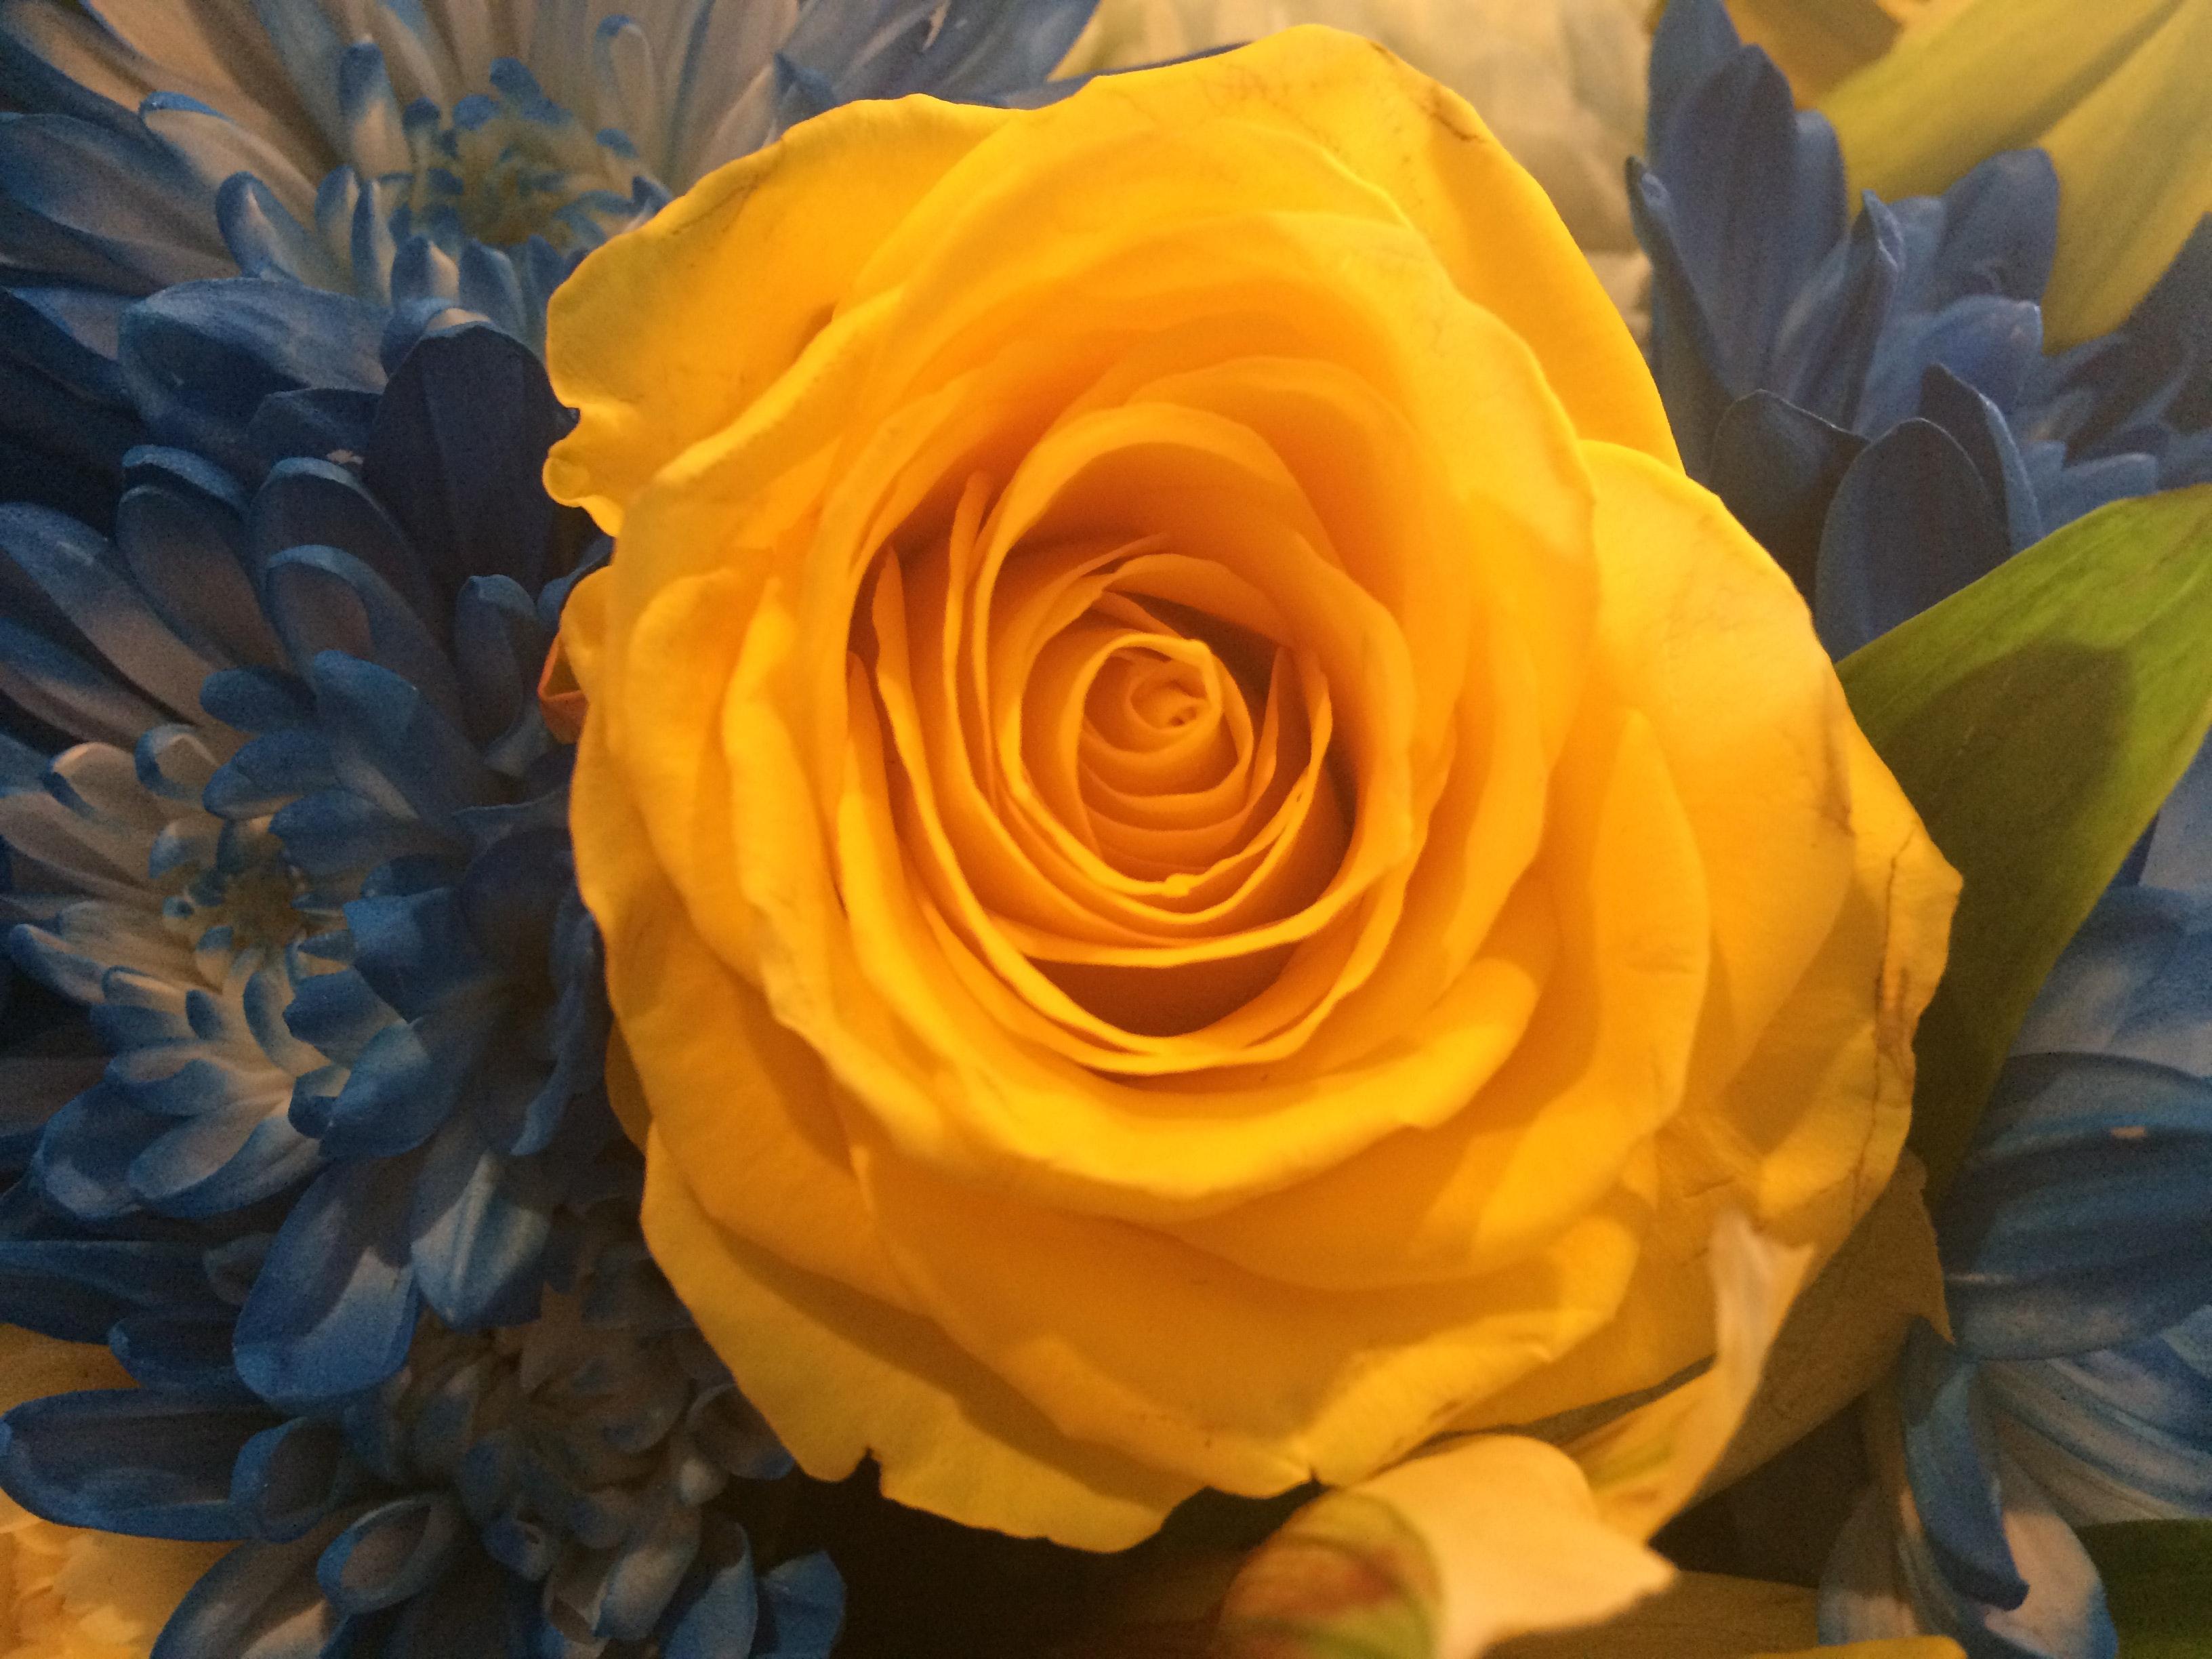 Free stock photo of beautiful flowers yellow roses free download izmirmasajfo